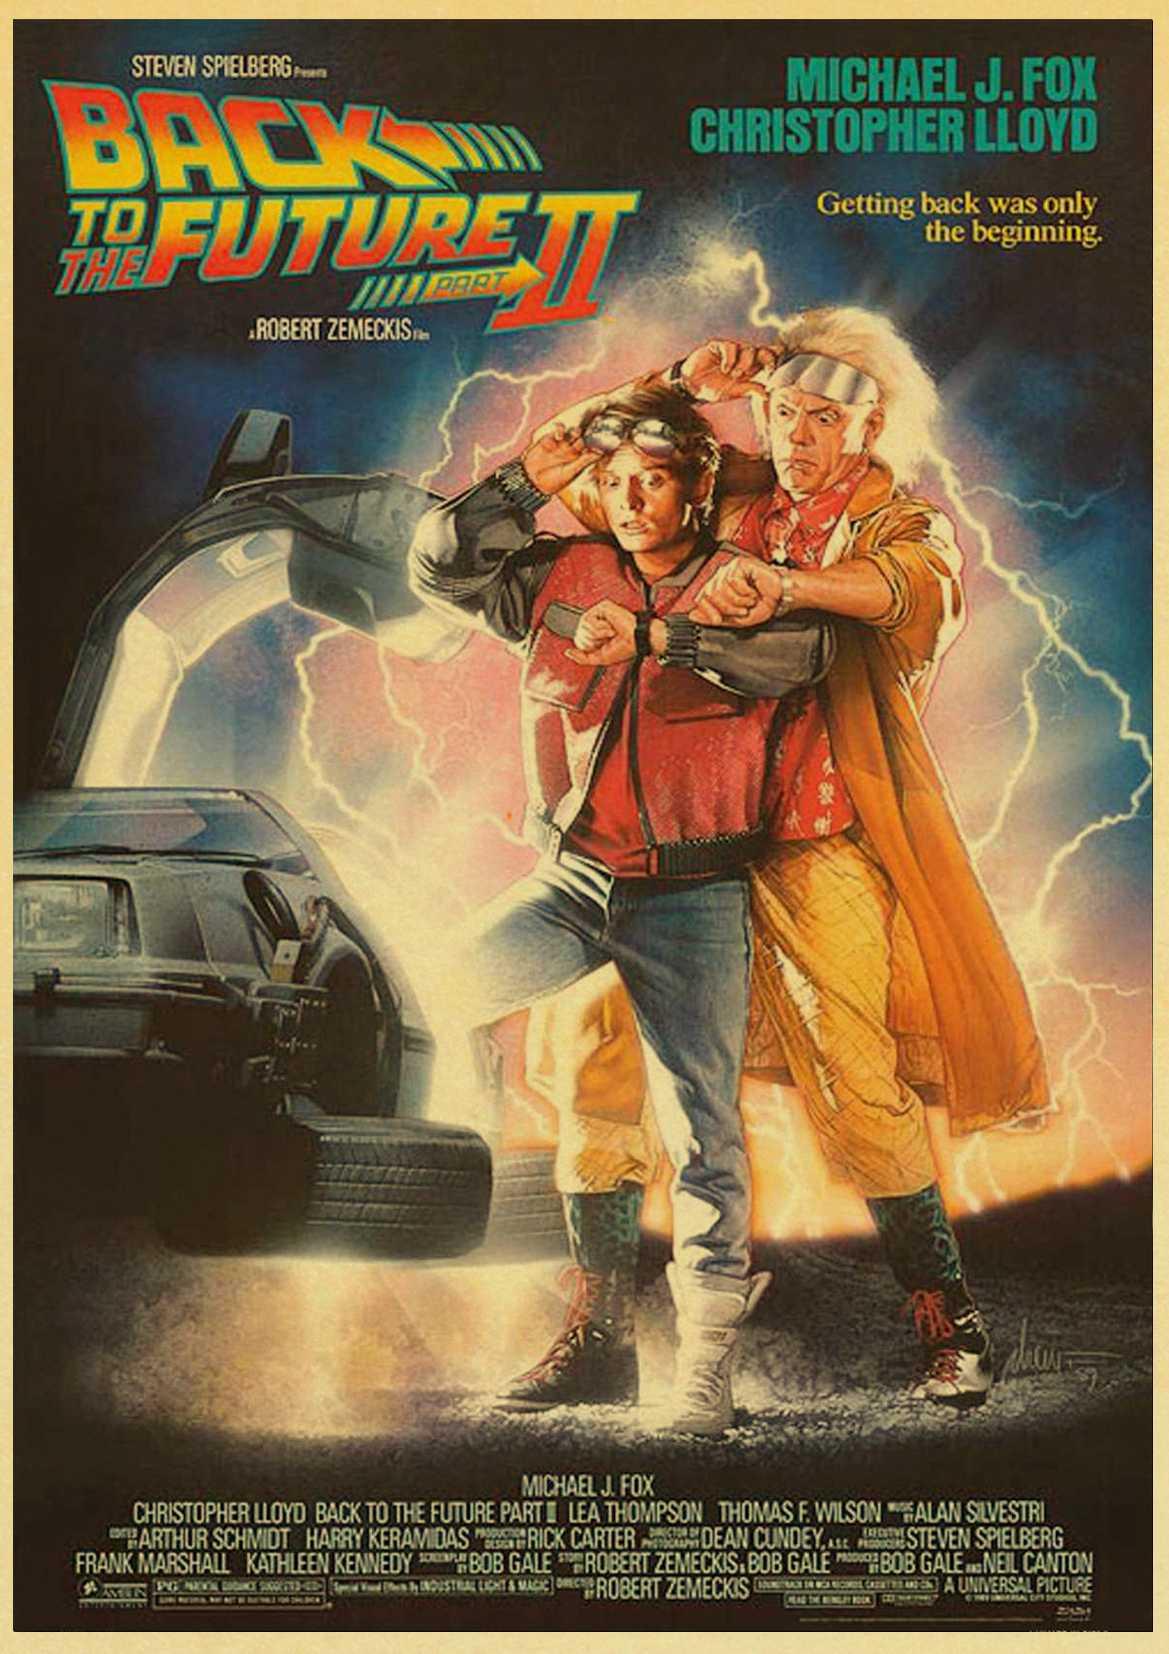 HTB1BwHBlf9TBuNjy0Fcq6zeiFXao Sci-fi Back to The Future Film Propaganda Retro Kraft Poster Decorative DIY Wall Canvas Sticker Home Bar Art Posters Decor